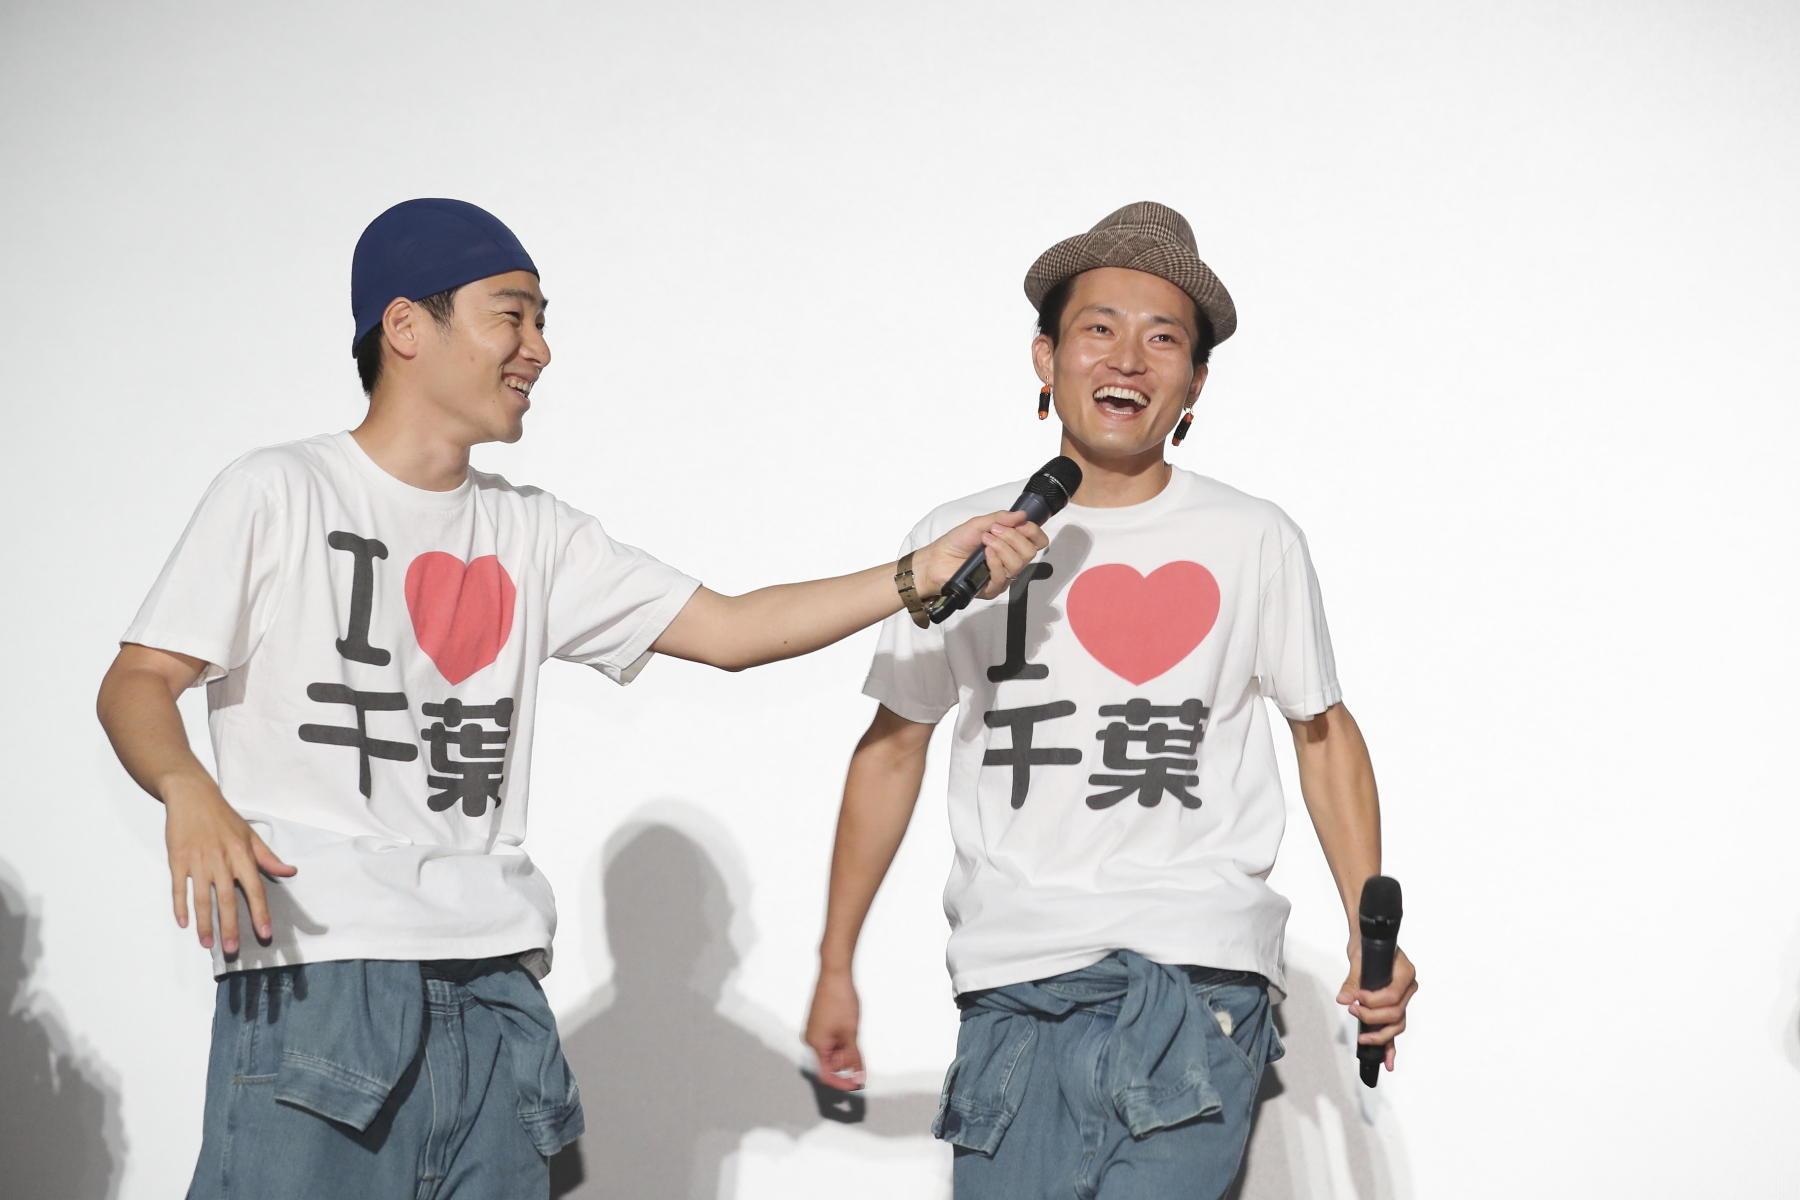 http://news.yoshimoto.co.jp/20180525161819-9a71746bfeb39d39aaa6324a2da09f42323f13ad.jpg